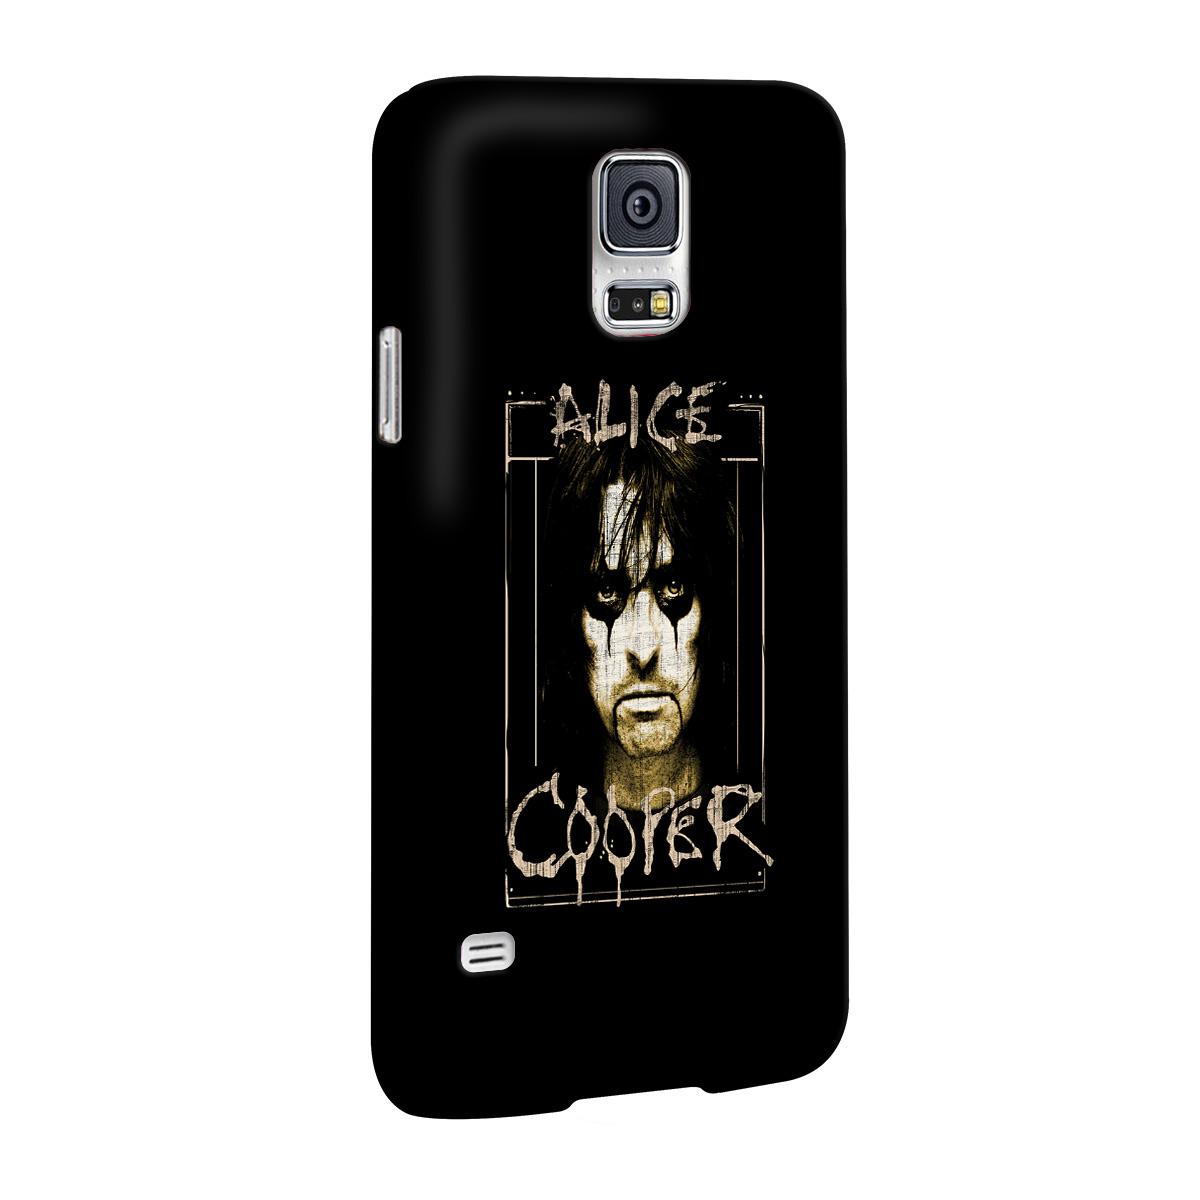 Capa para Samsung Galaxy S5 Alice Cooper Photo